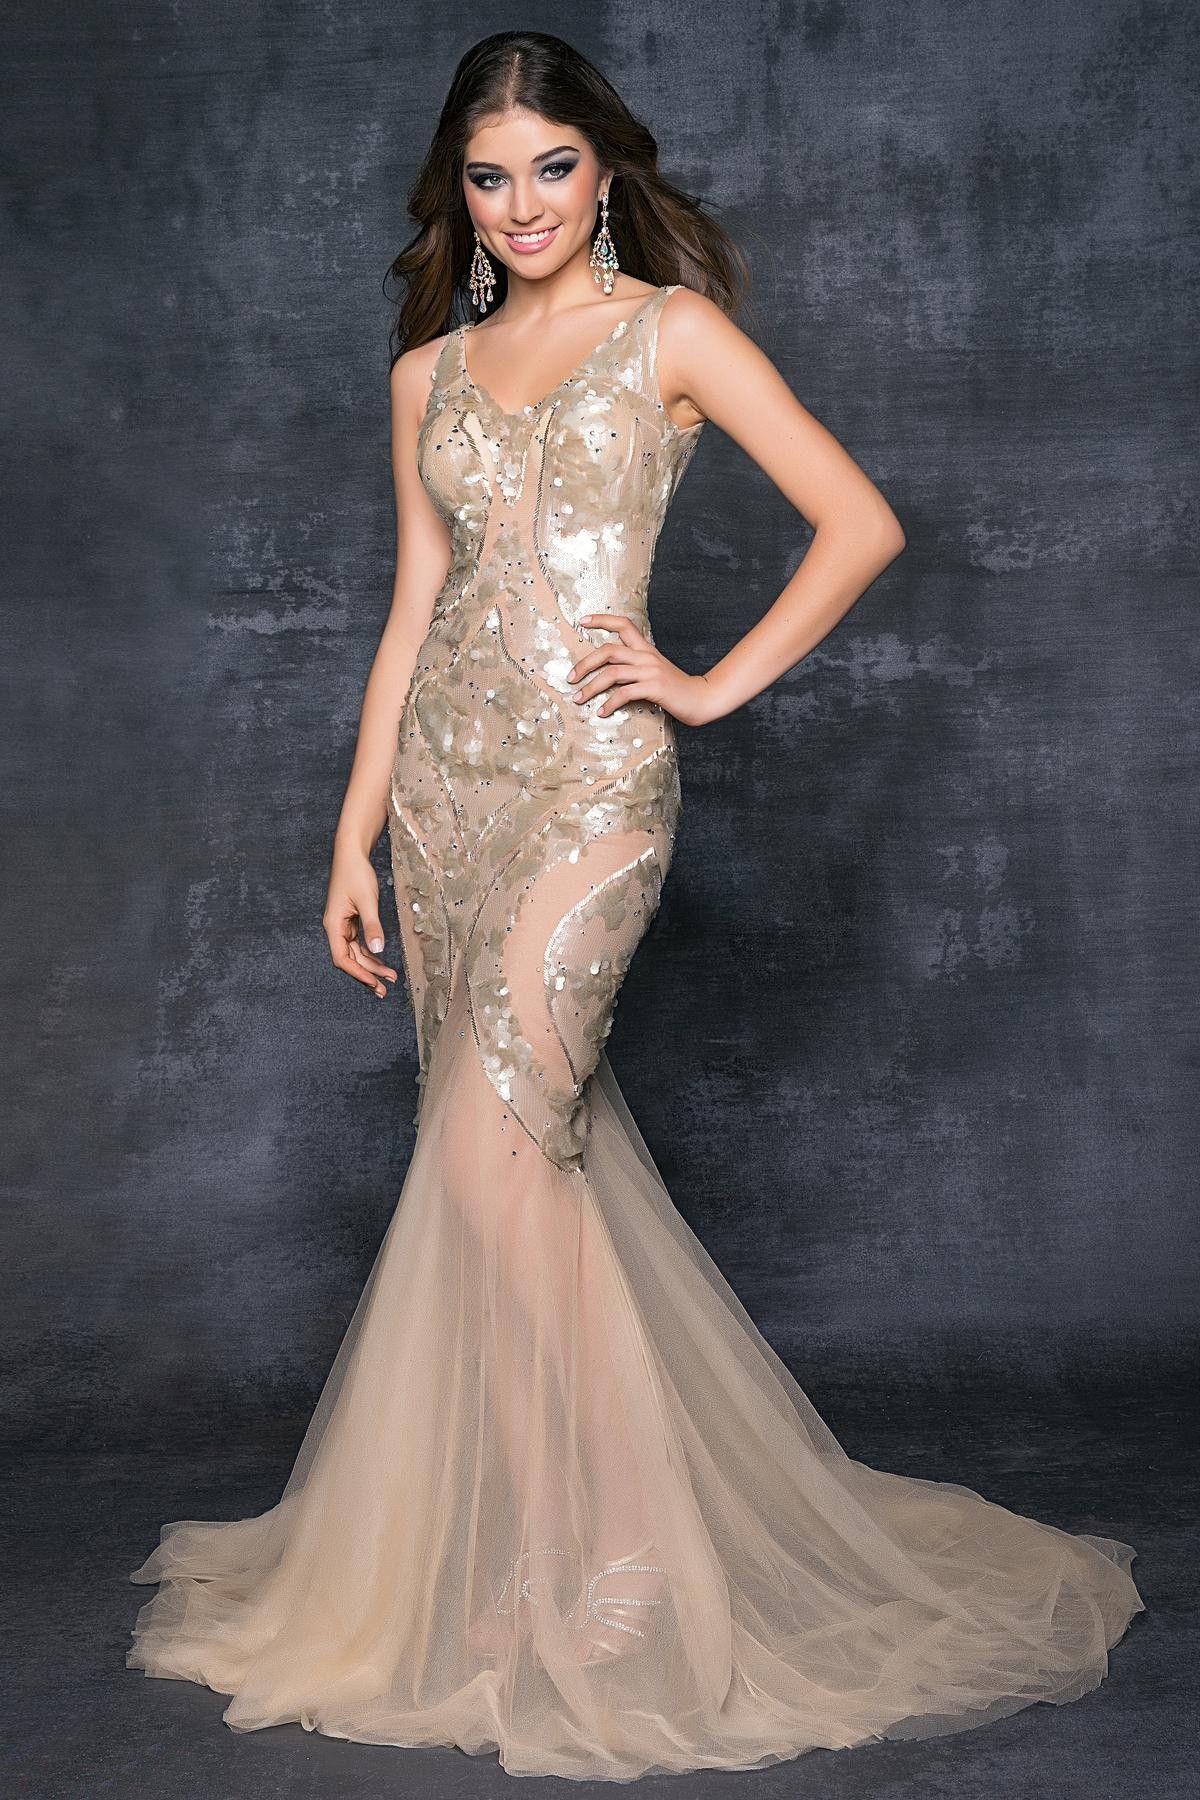 Champagne & Nude Sequin Illusion Mermaid Prom Gown $349.99 Designer ...